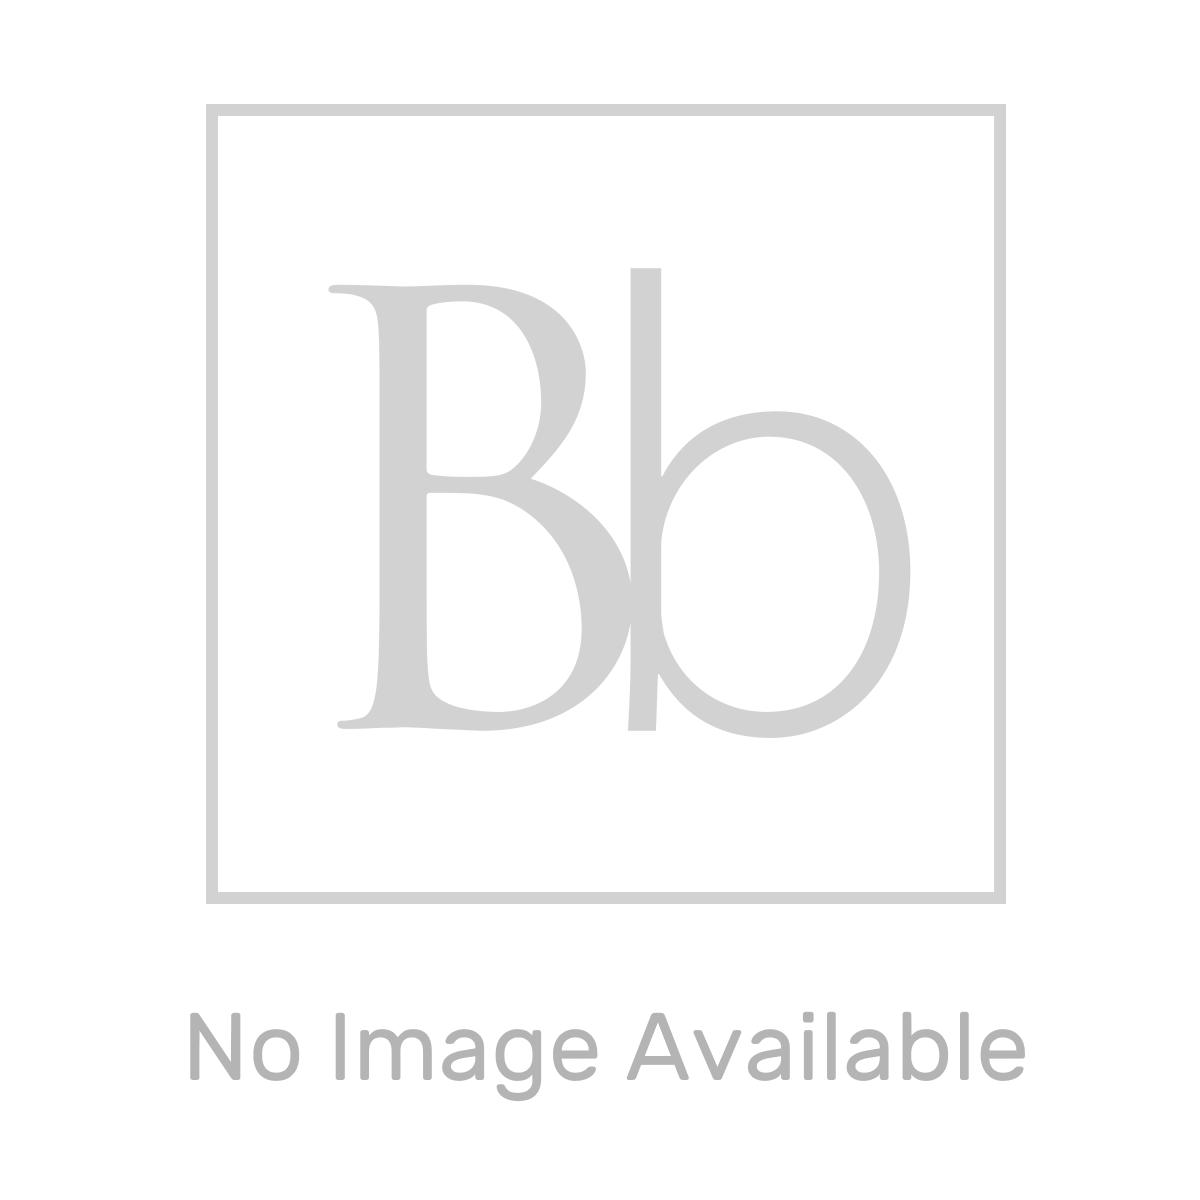 Aquadart White Slate Shower Tray 1700 x 700 Lifestyle